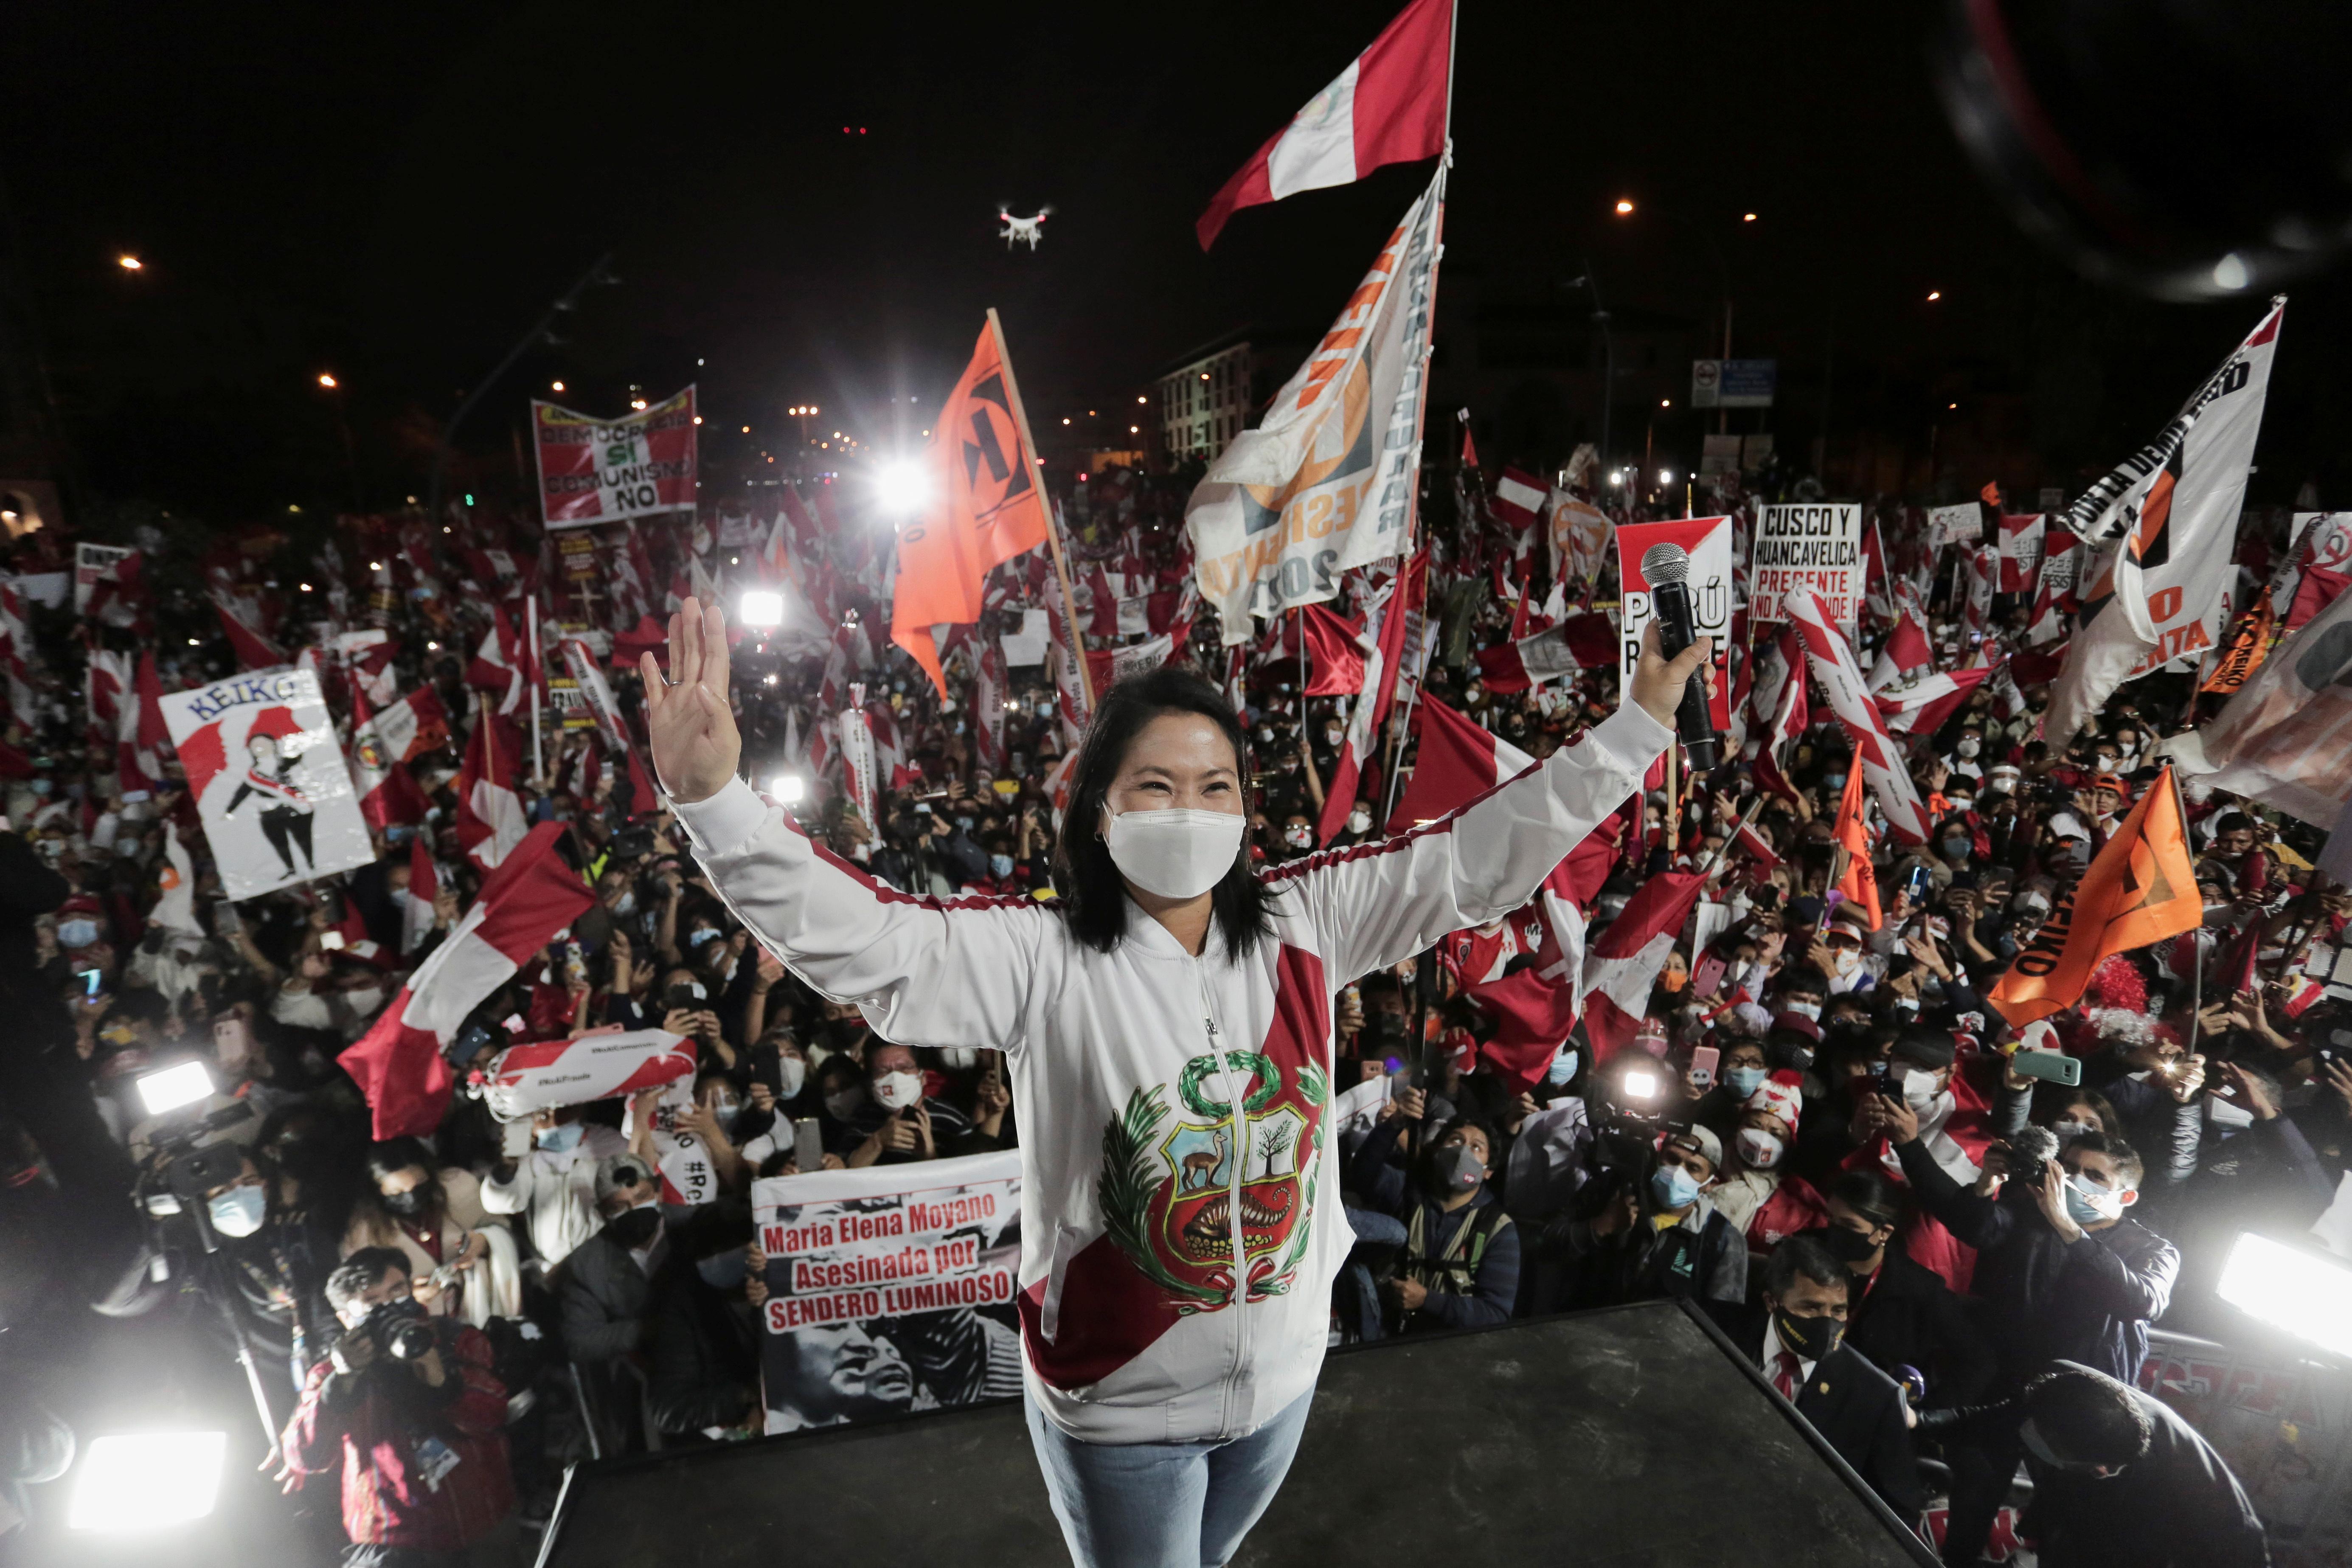 Peru's presidential candidate Keiko Fujimori gestures to supporters in Lima, Peru June 19, 2021. REUTERS/Gerardo Marin